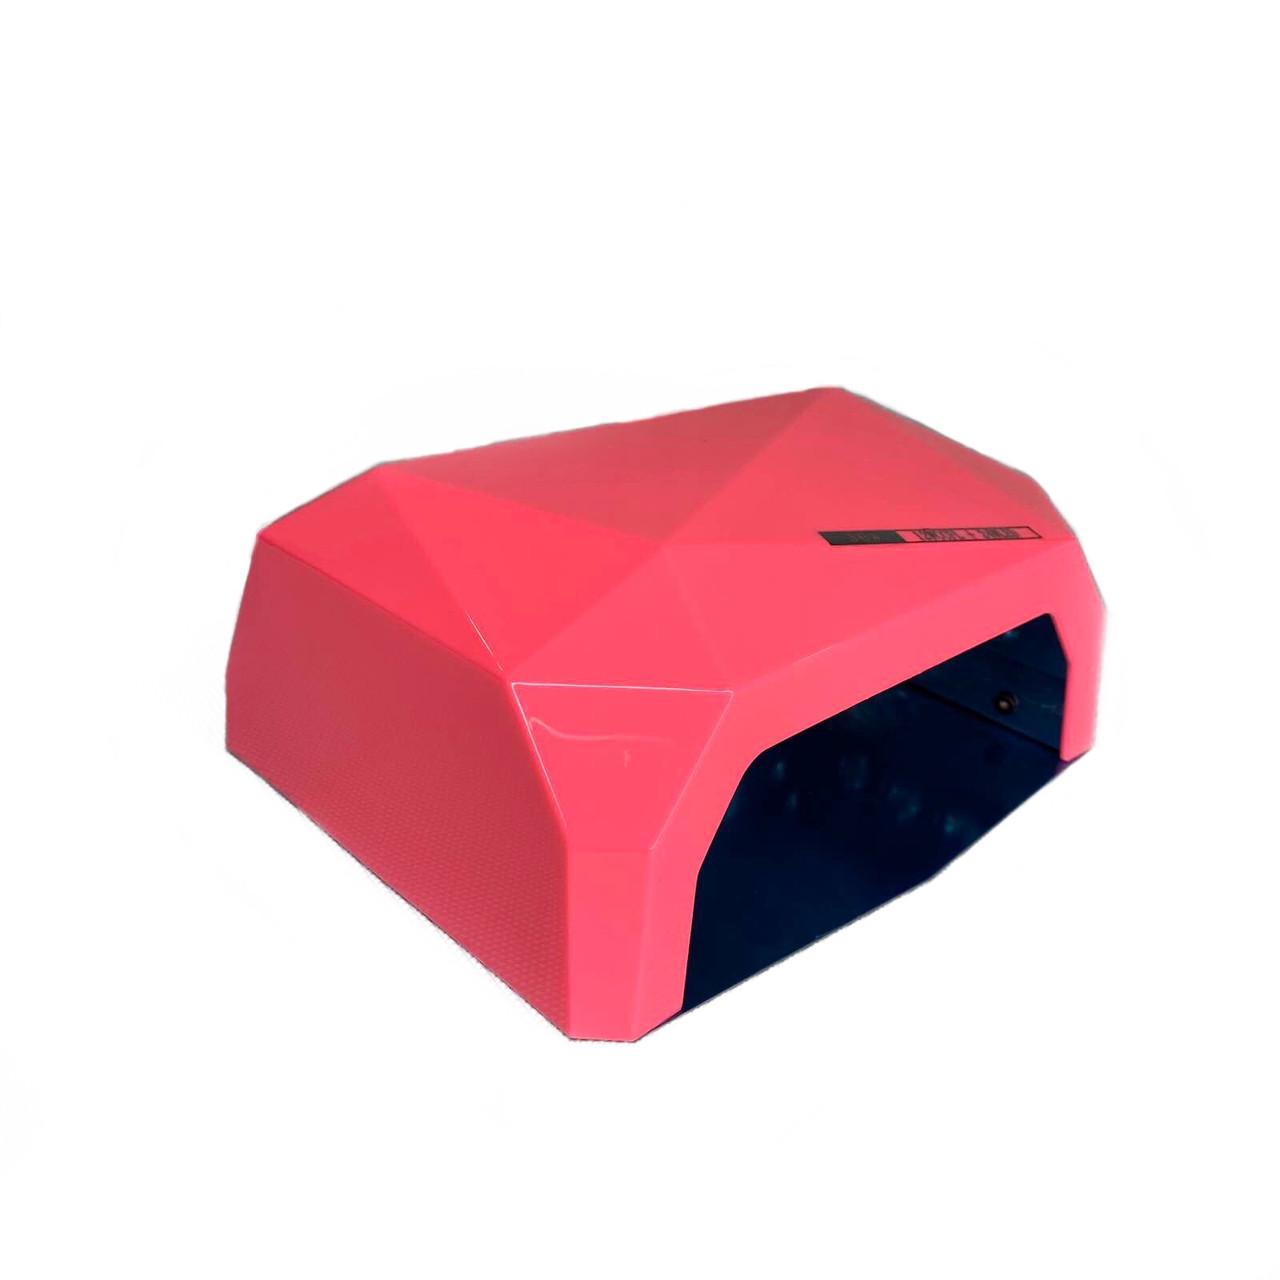 Лампа гибридная Diamond CCFL + LED   (36 W) розовая